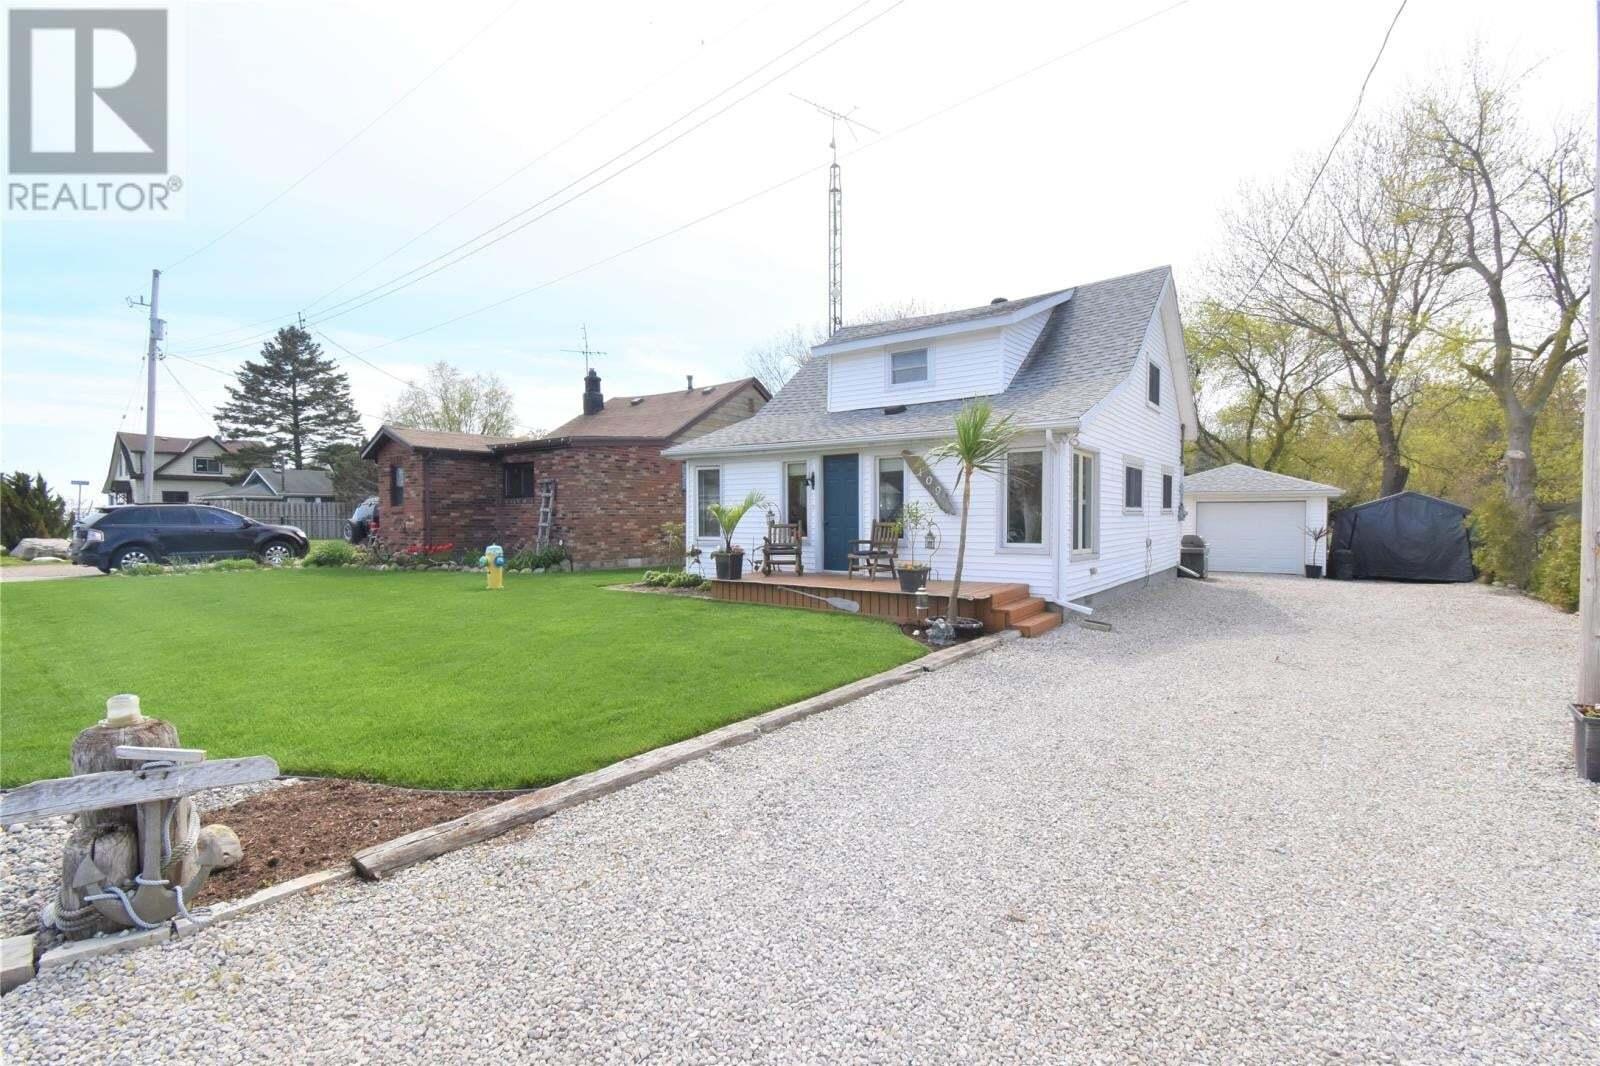 House for sale at 109 Arner Townline  Kingsville Ontario - MLS: 20005470